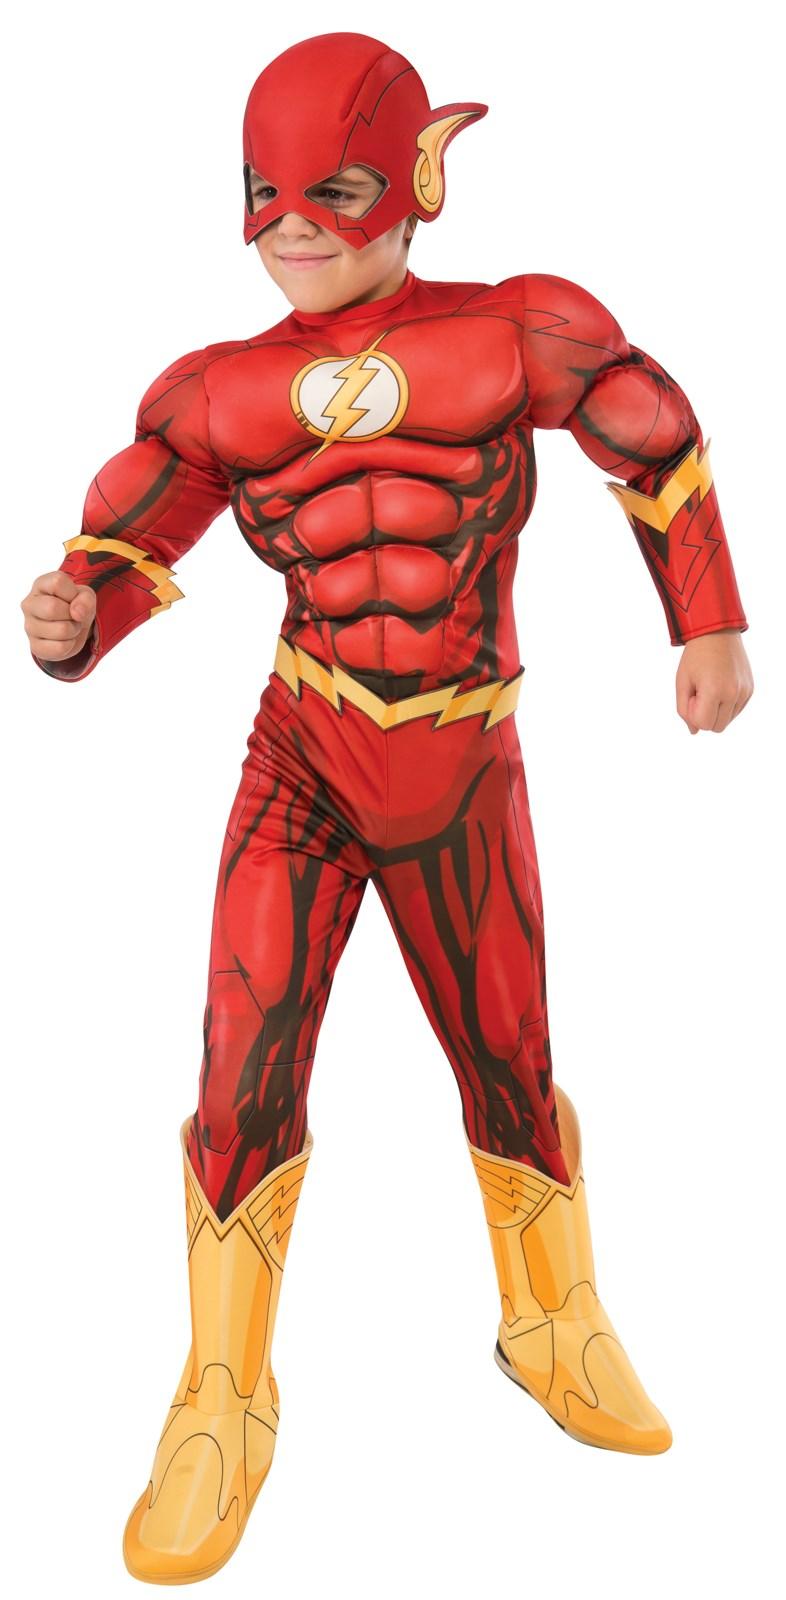 DC Comics Costumes | BuyCostumes.com